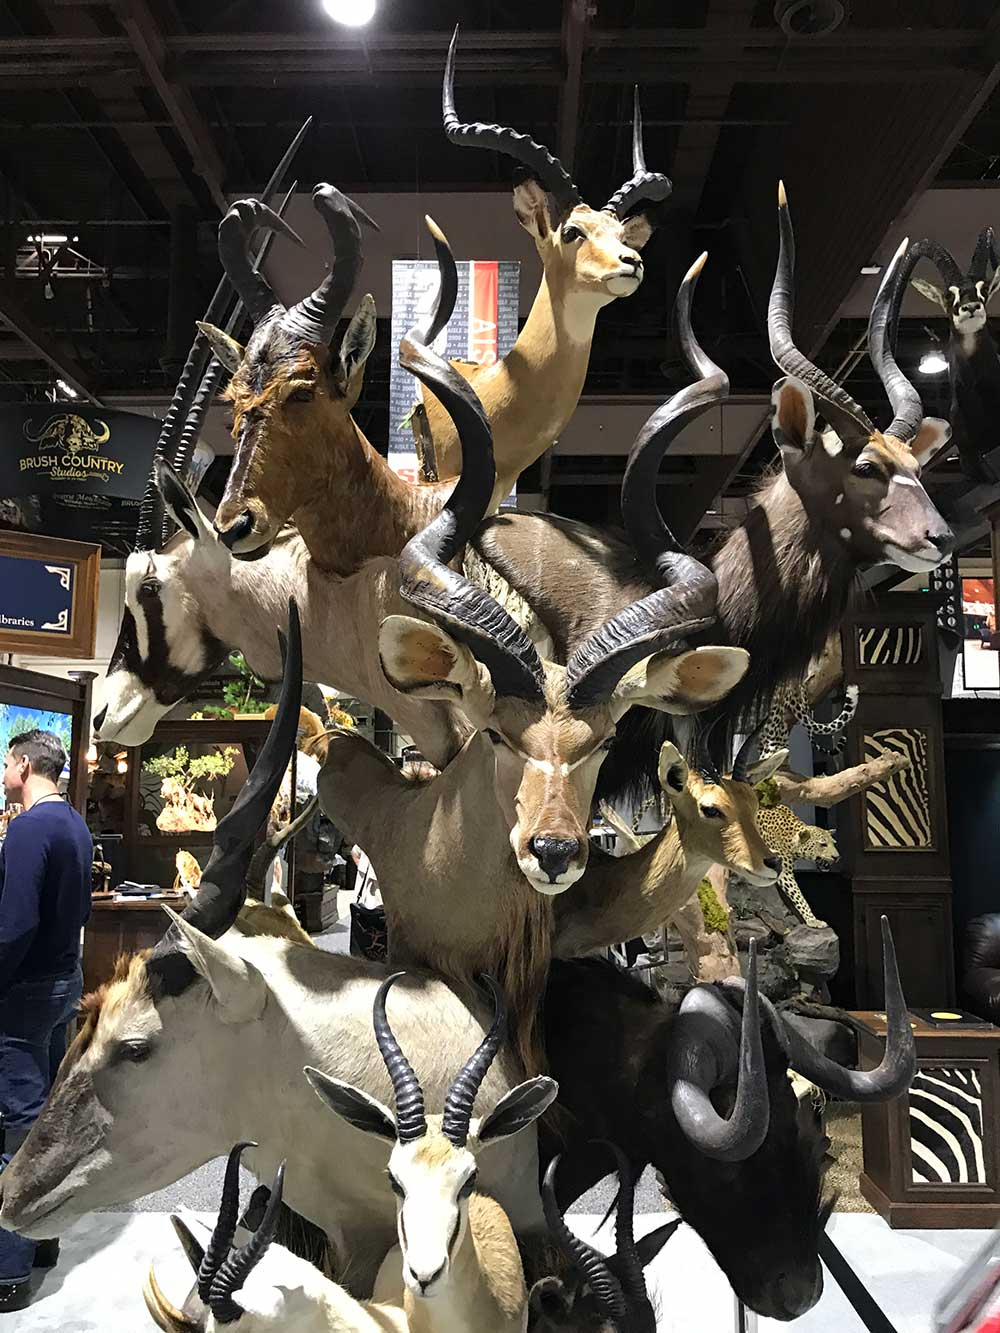 safari club international convention antelope taxidermy